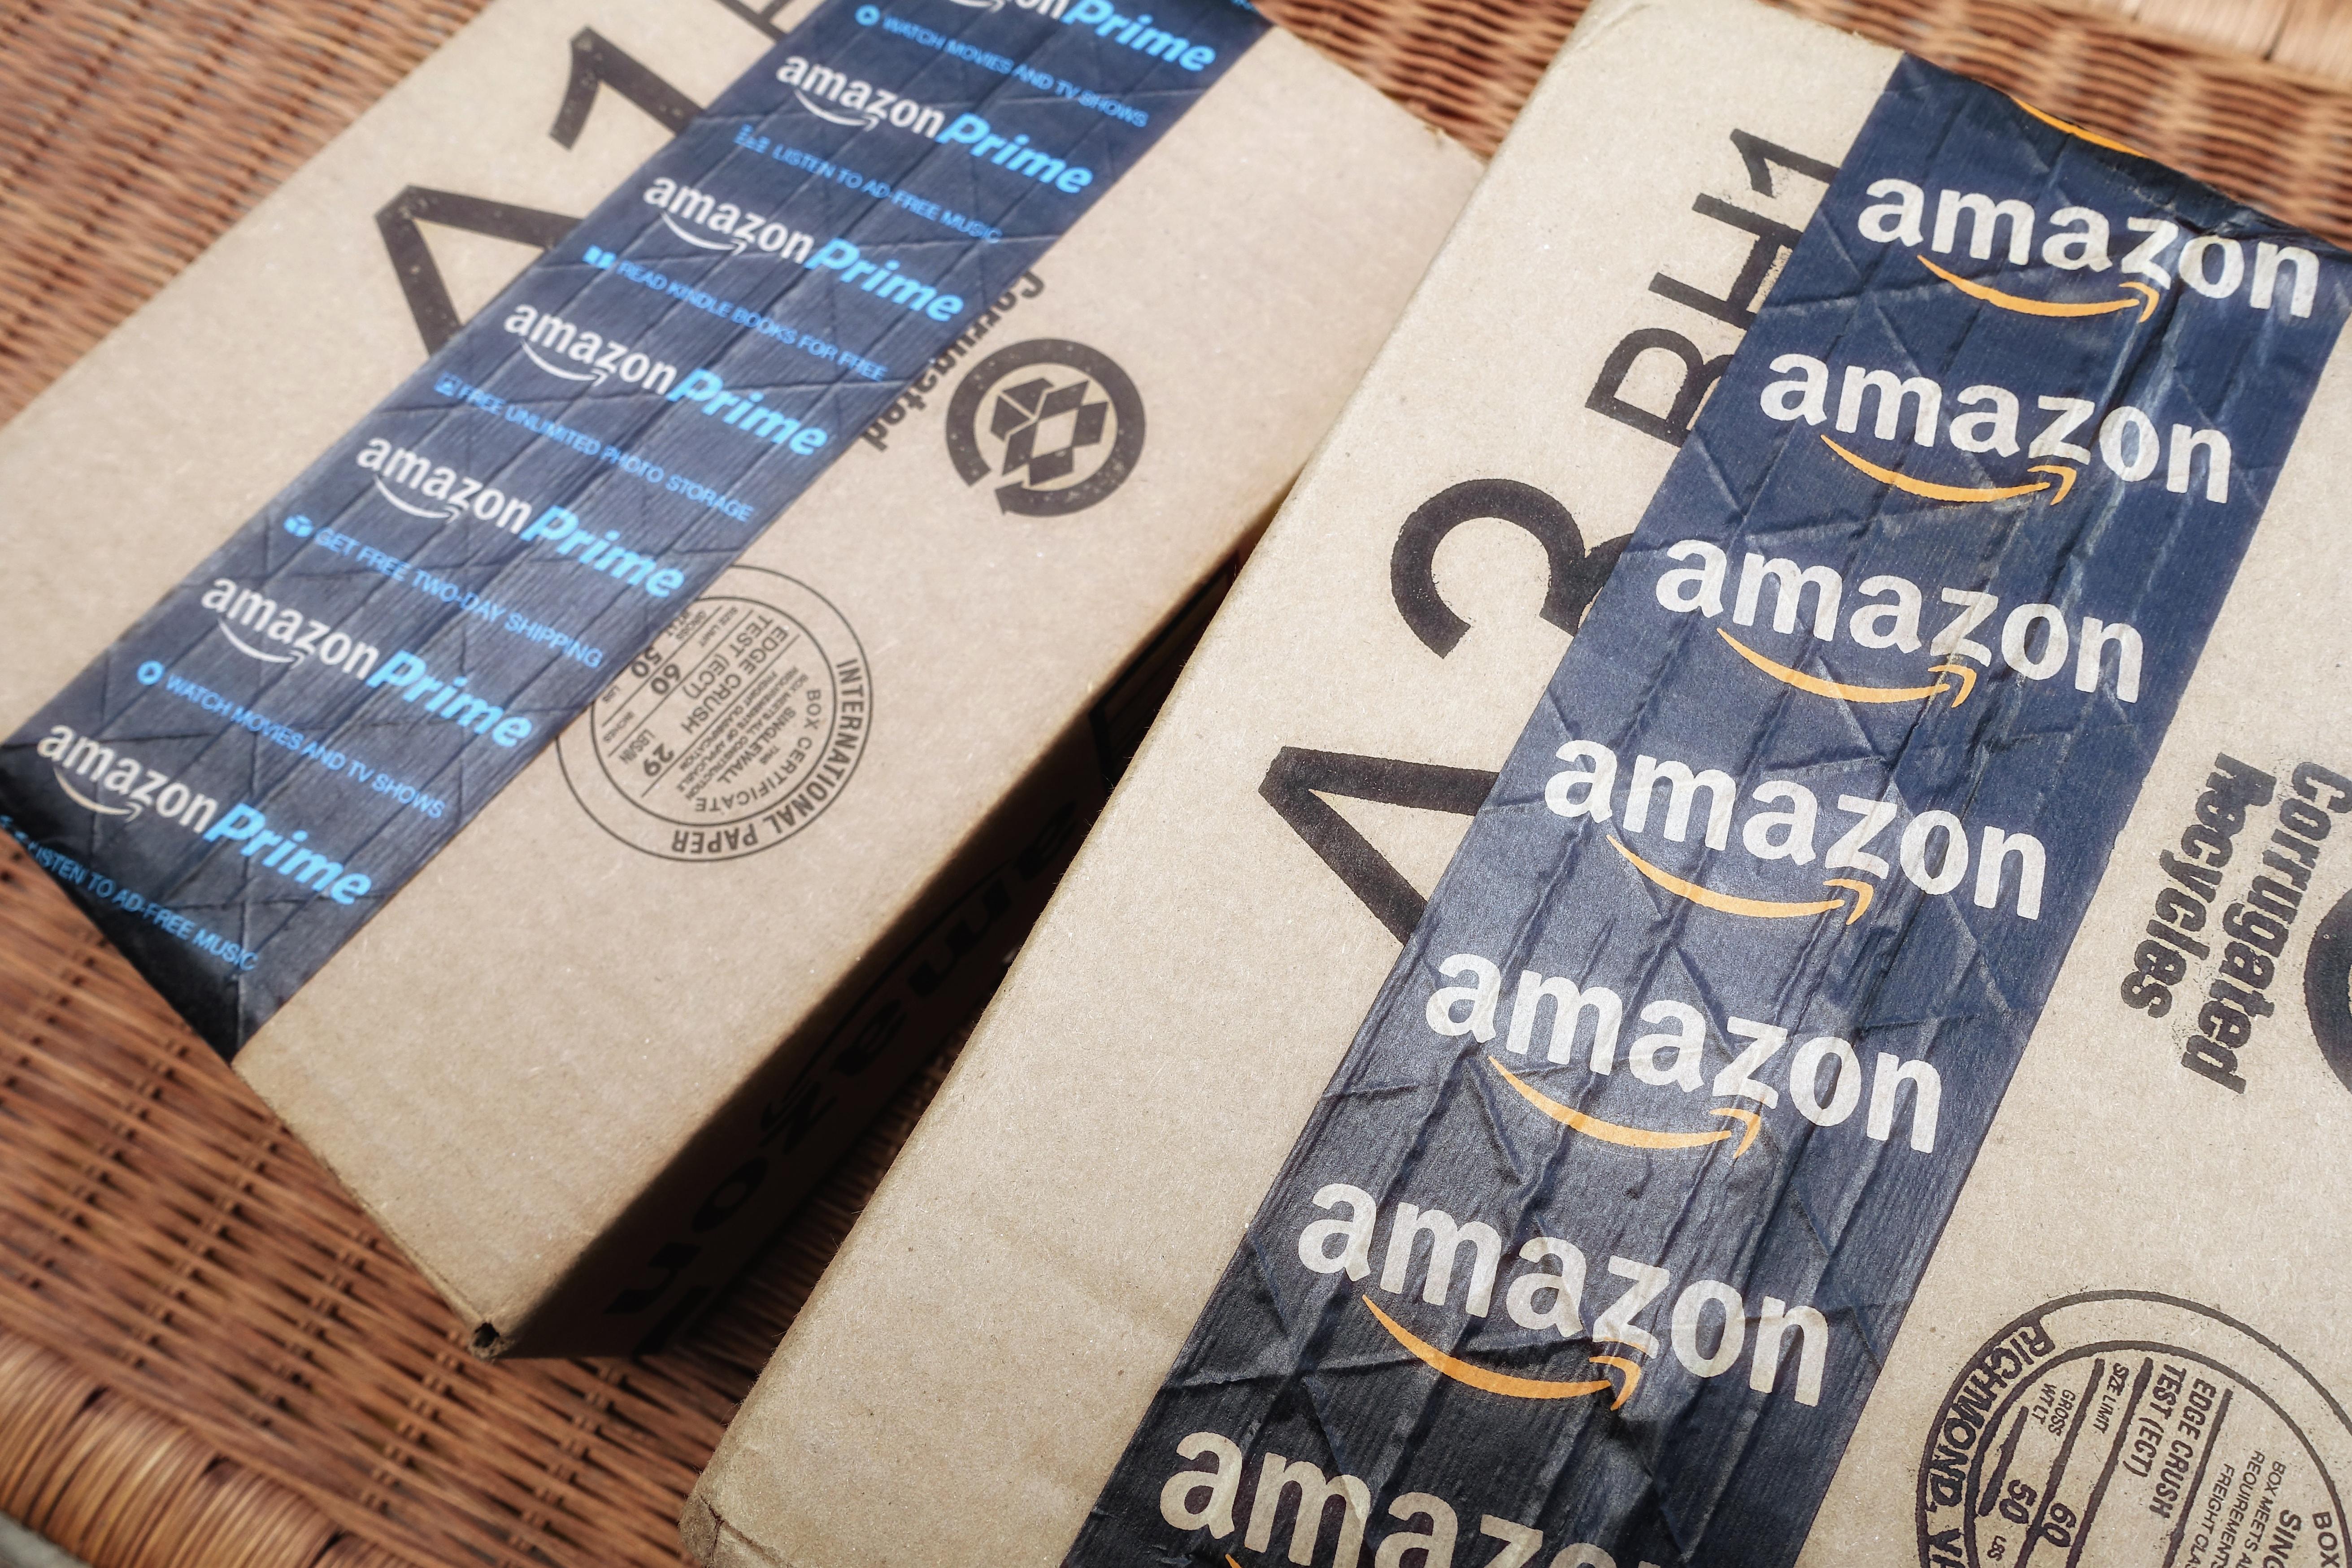 Amazon Celebrates Its Birthday With Amazing Sales